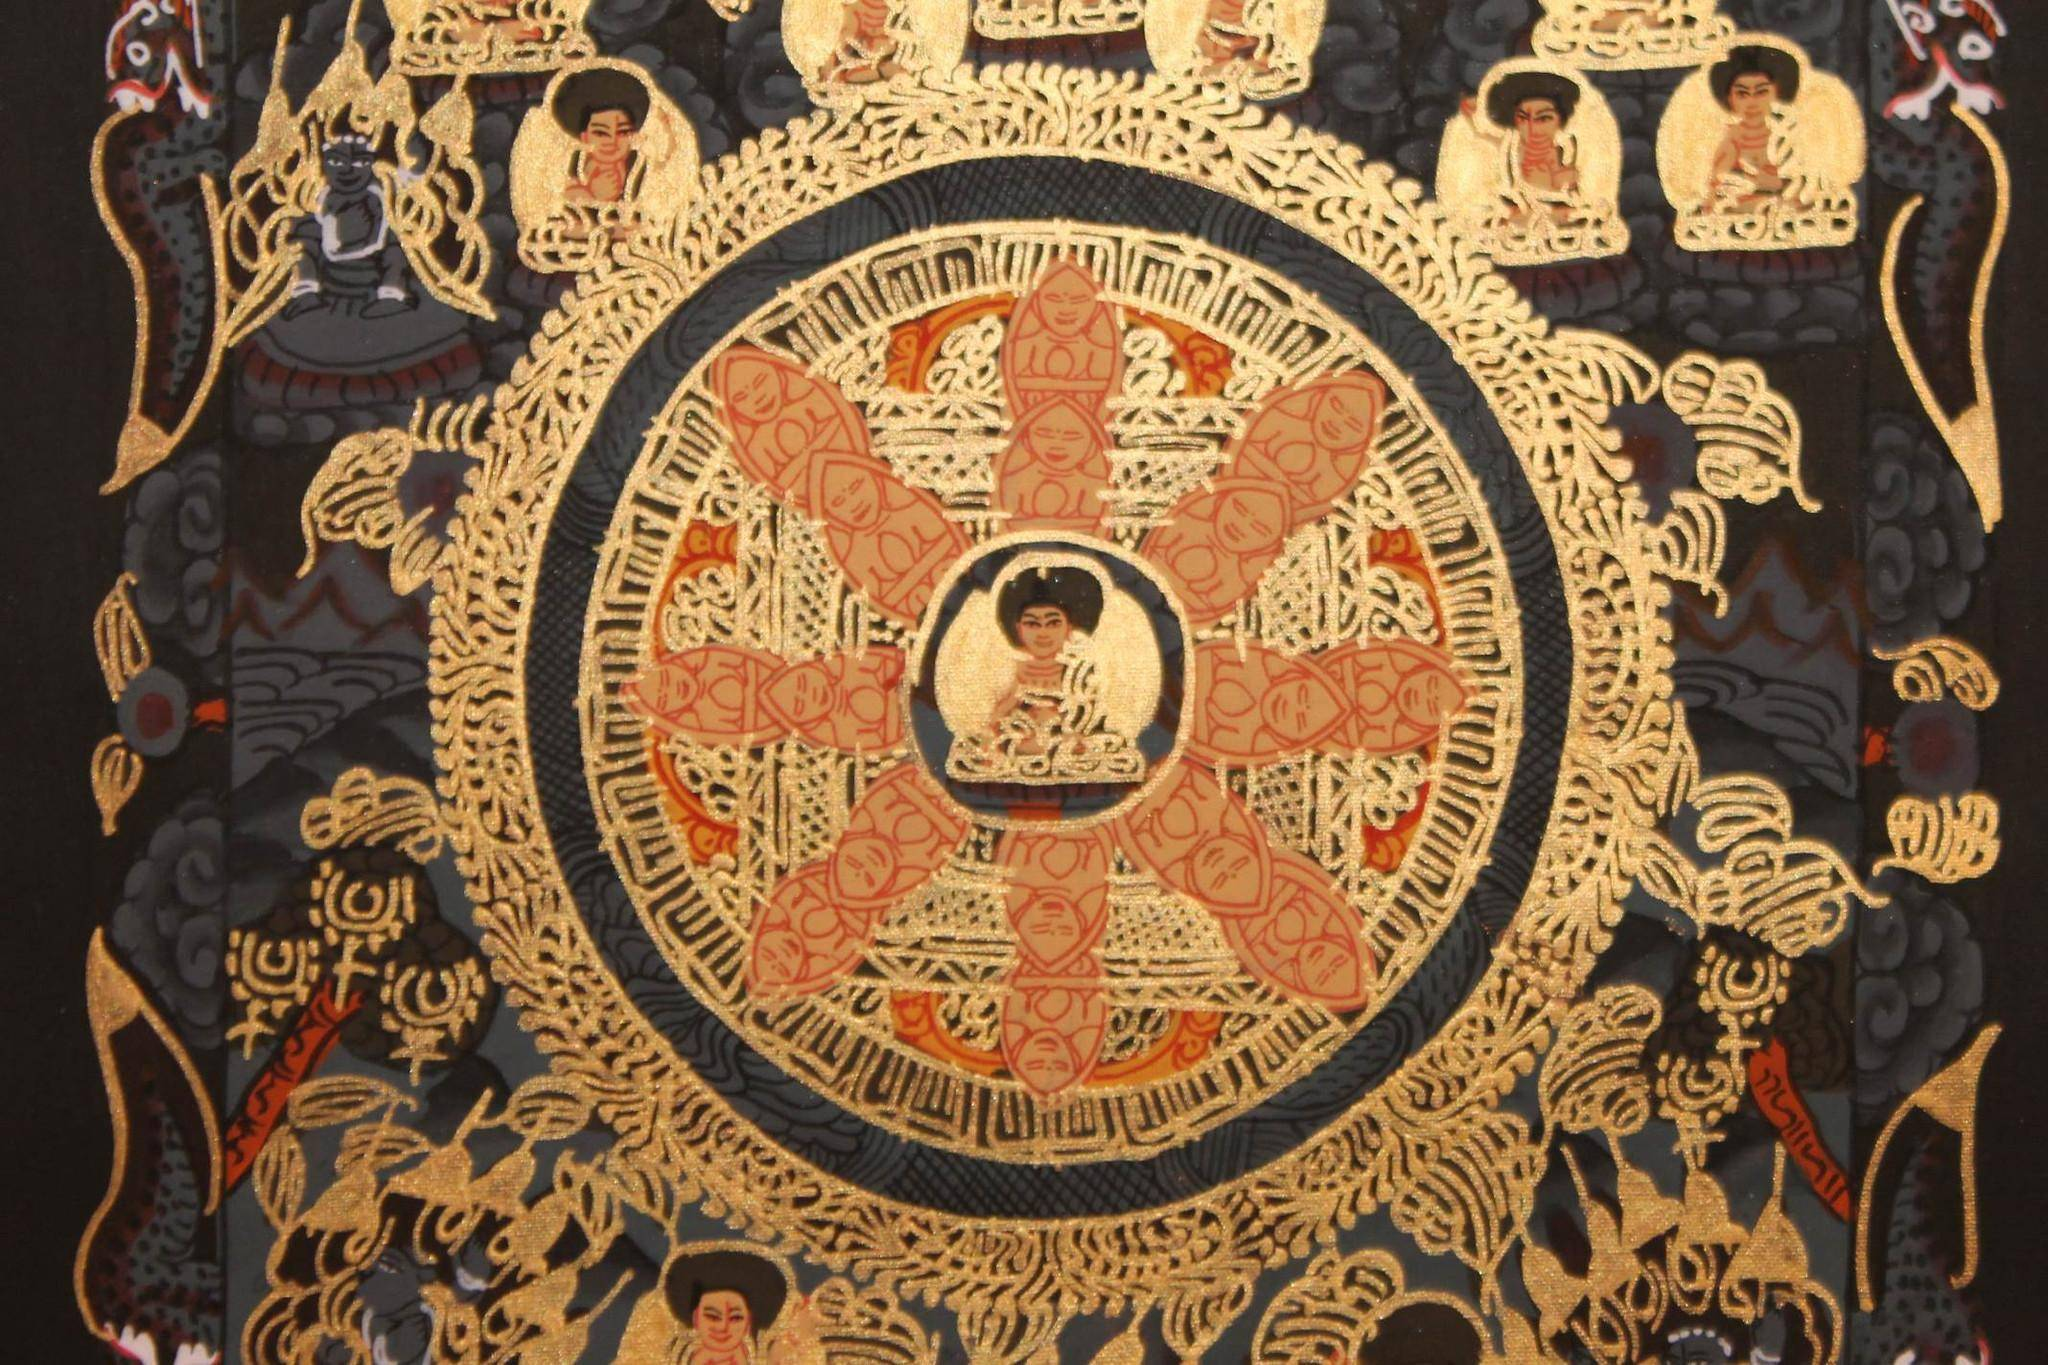 Buddha mandala thangka painting